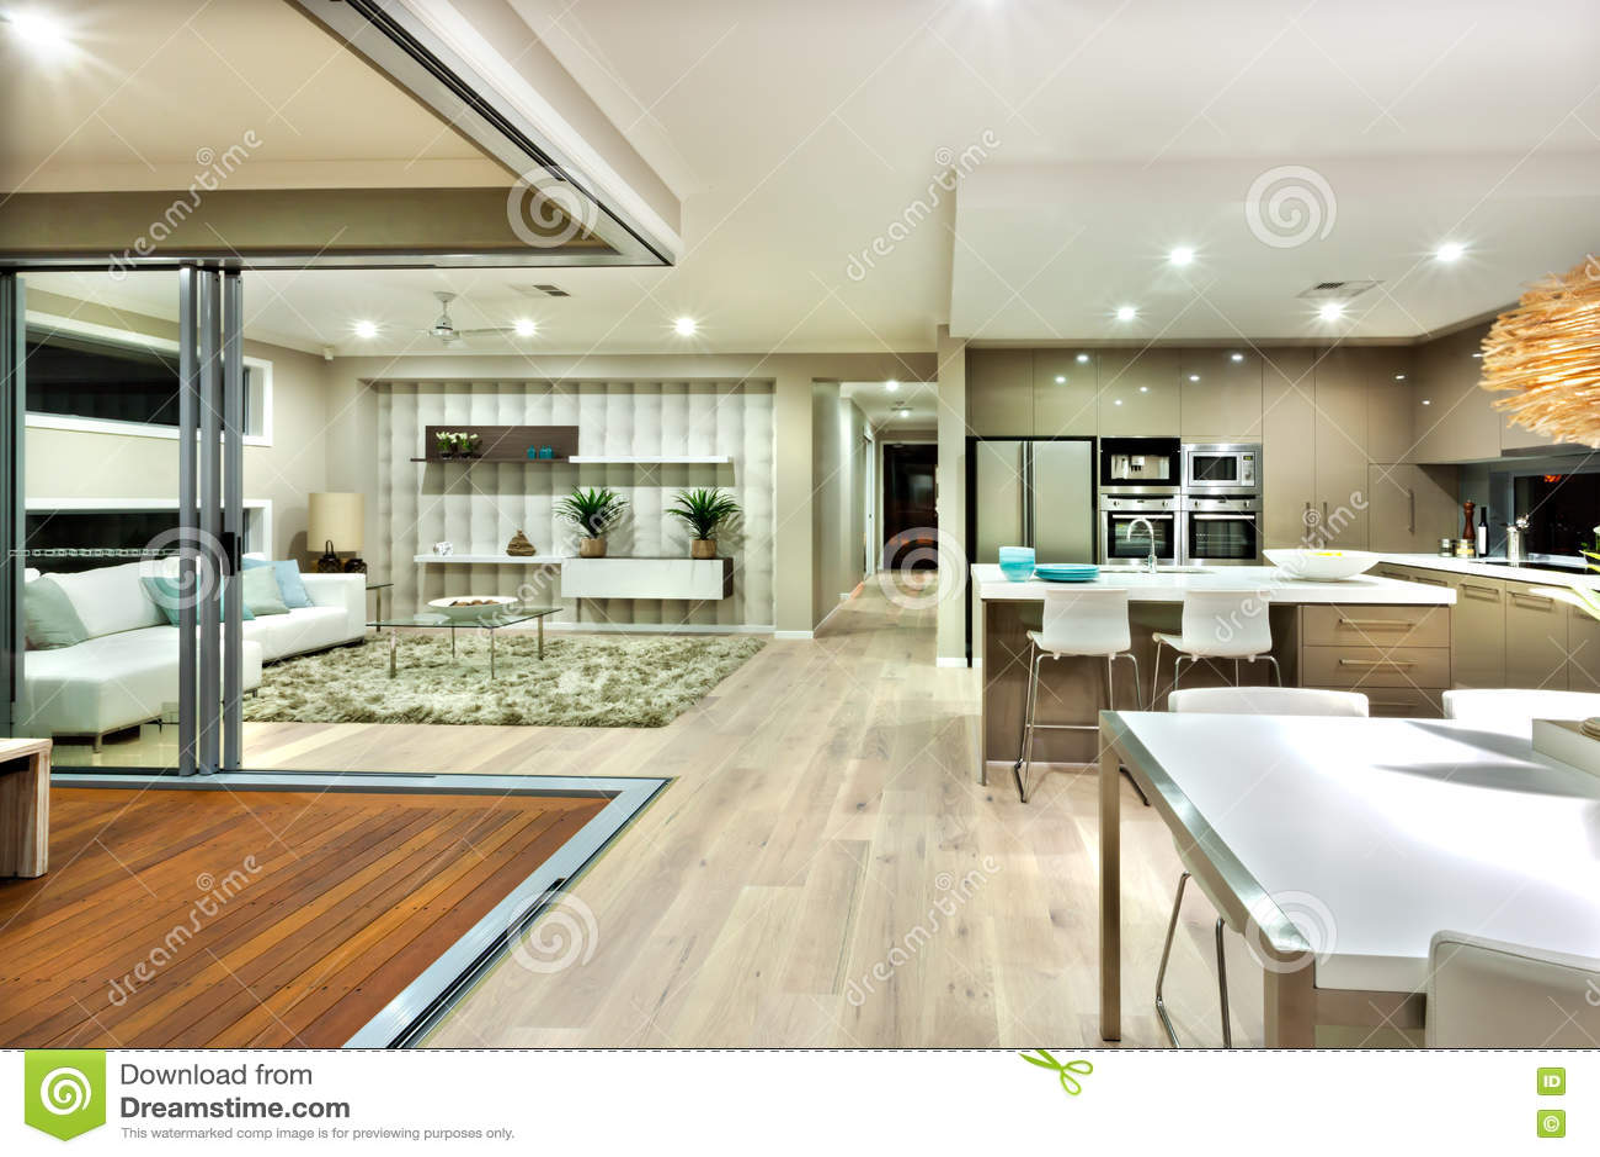 Interieur cuisine moderne cuisine moderne tonnant cour for Interieur cuisine moderne